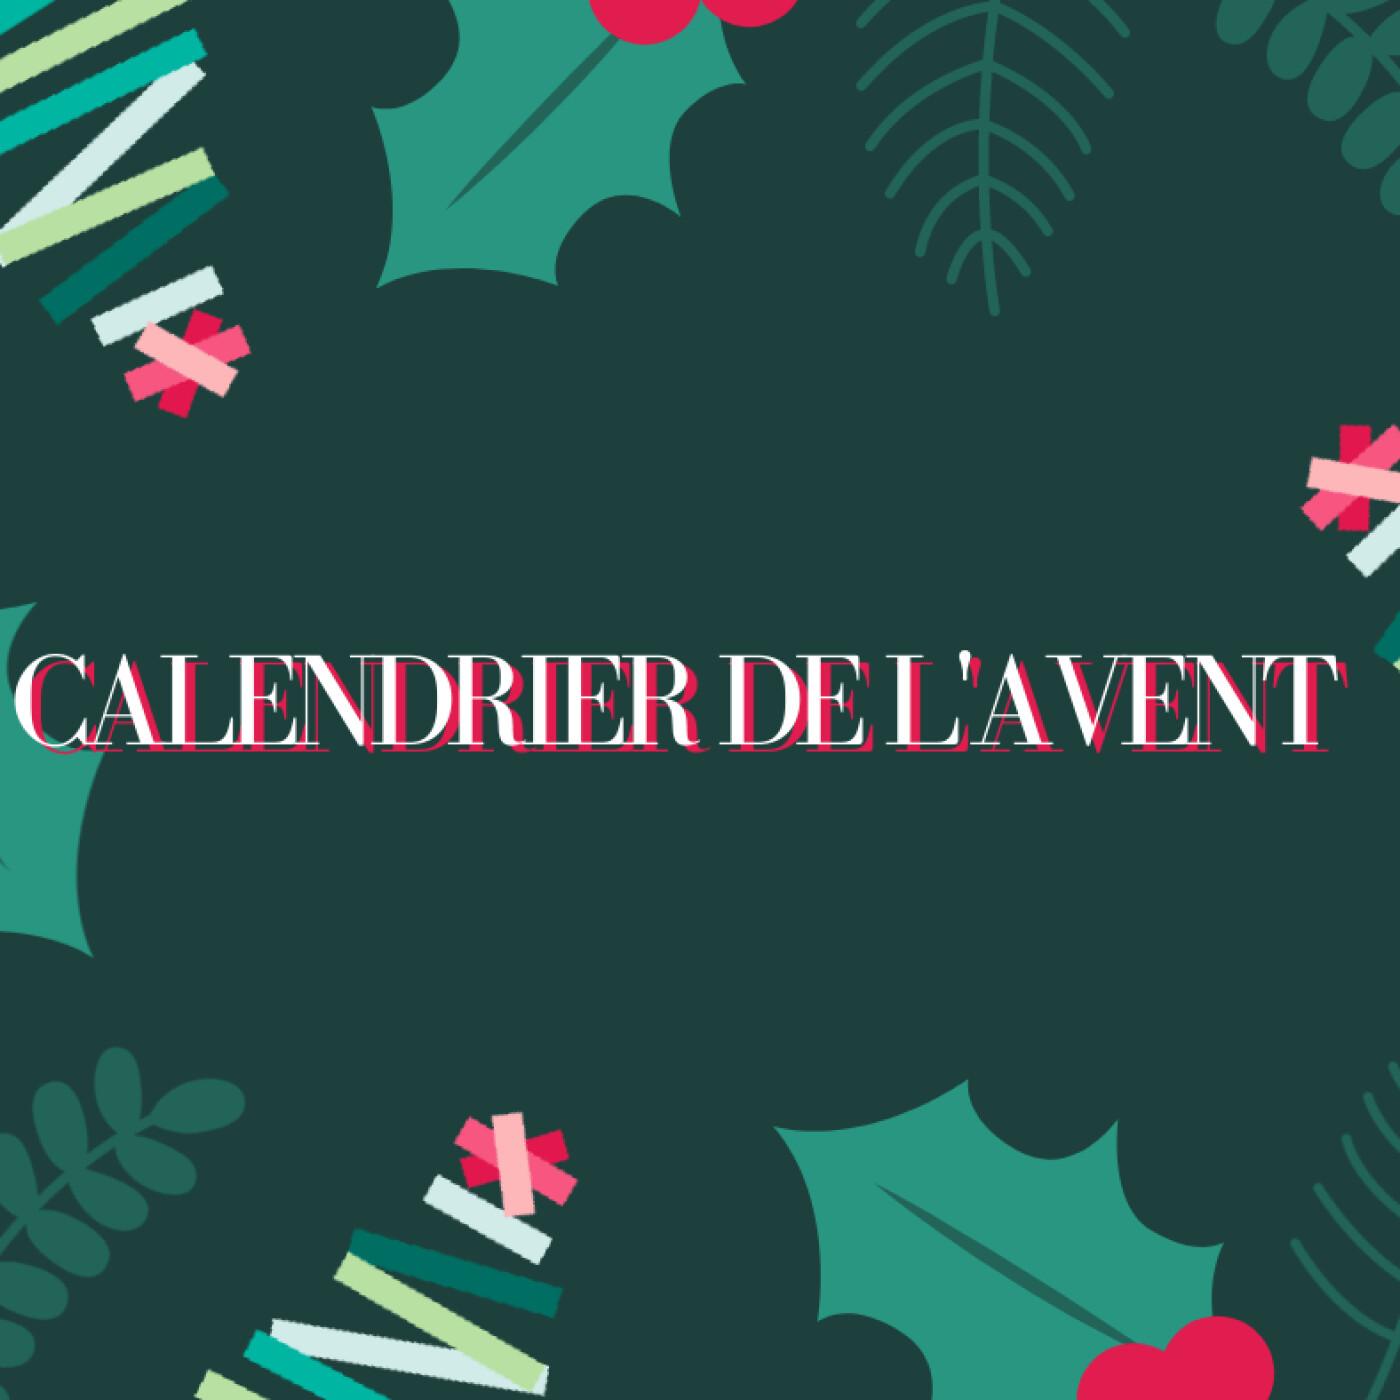 Advent Calendar # 16 - L'affaire Paul Bismuth